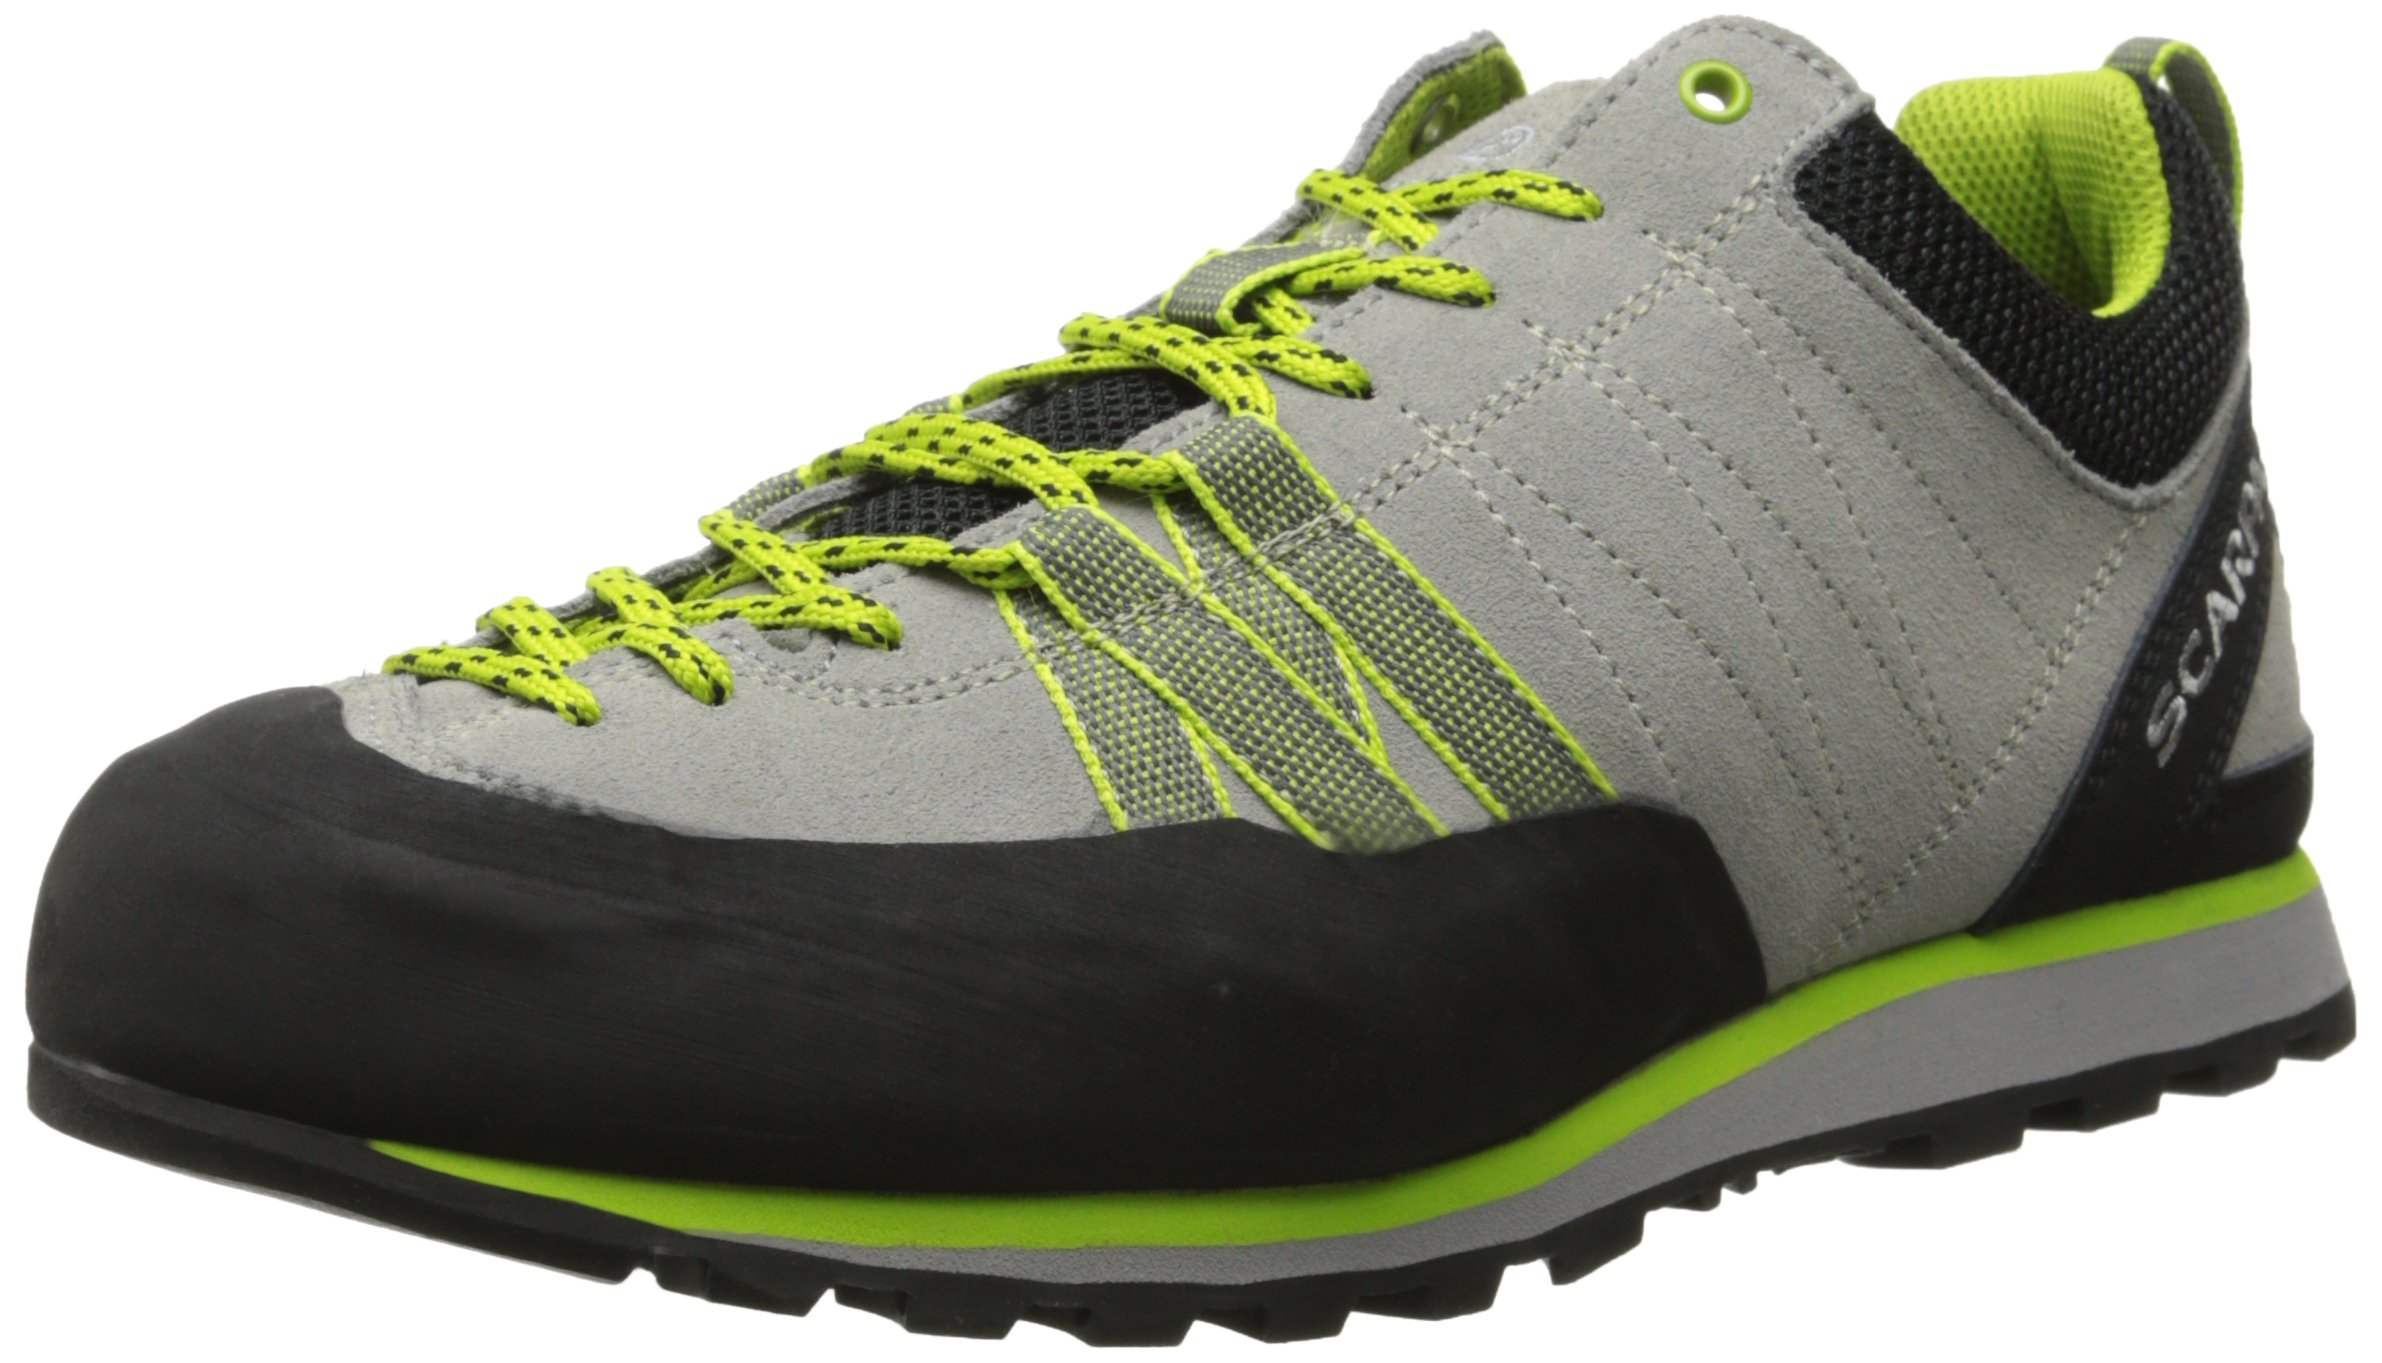 SCARPA Women's Crux Approach Shoe, Oyster/Green Glow, 42 EU/10 M US